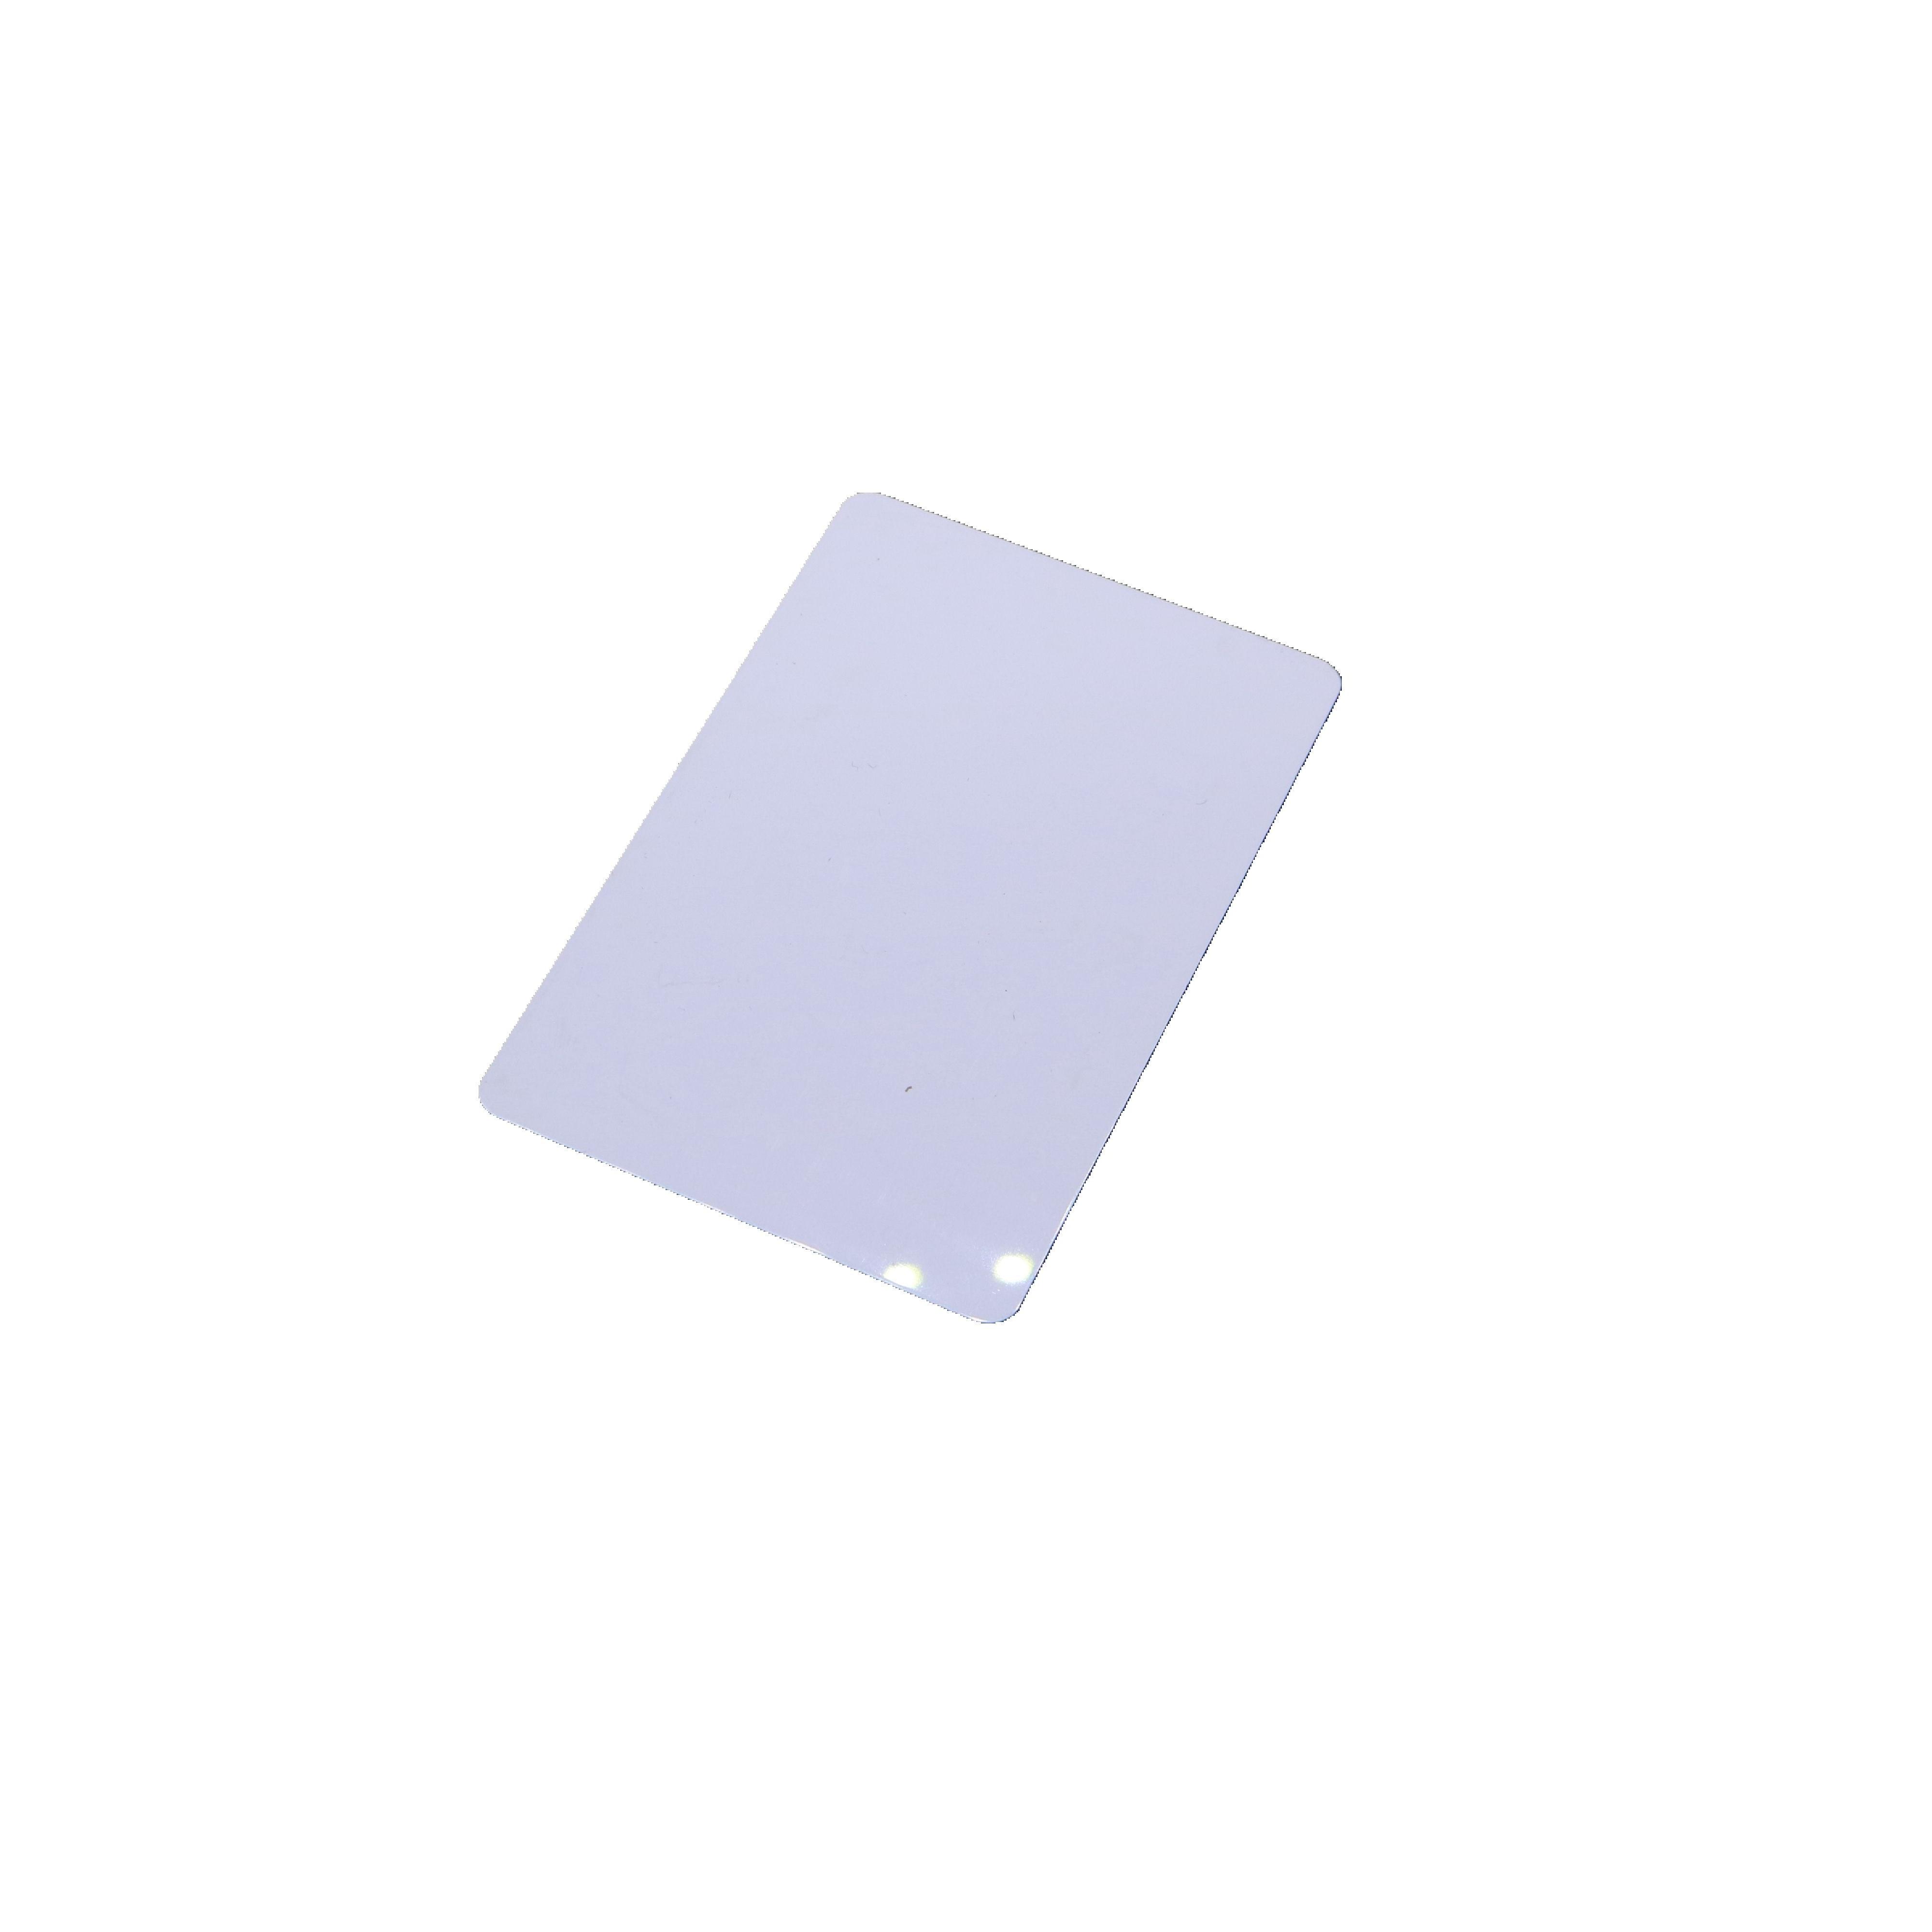 ISO15693 SLIX SL2S2002 13.56MHz 1K RFID IC Card